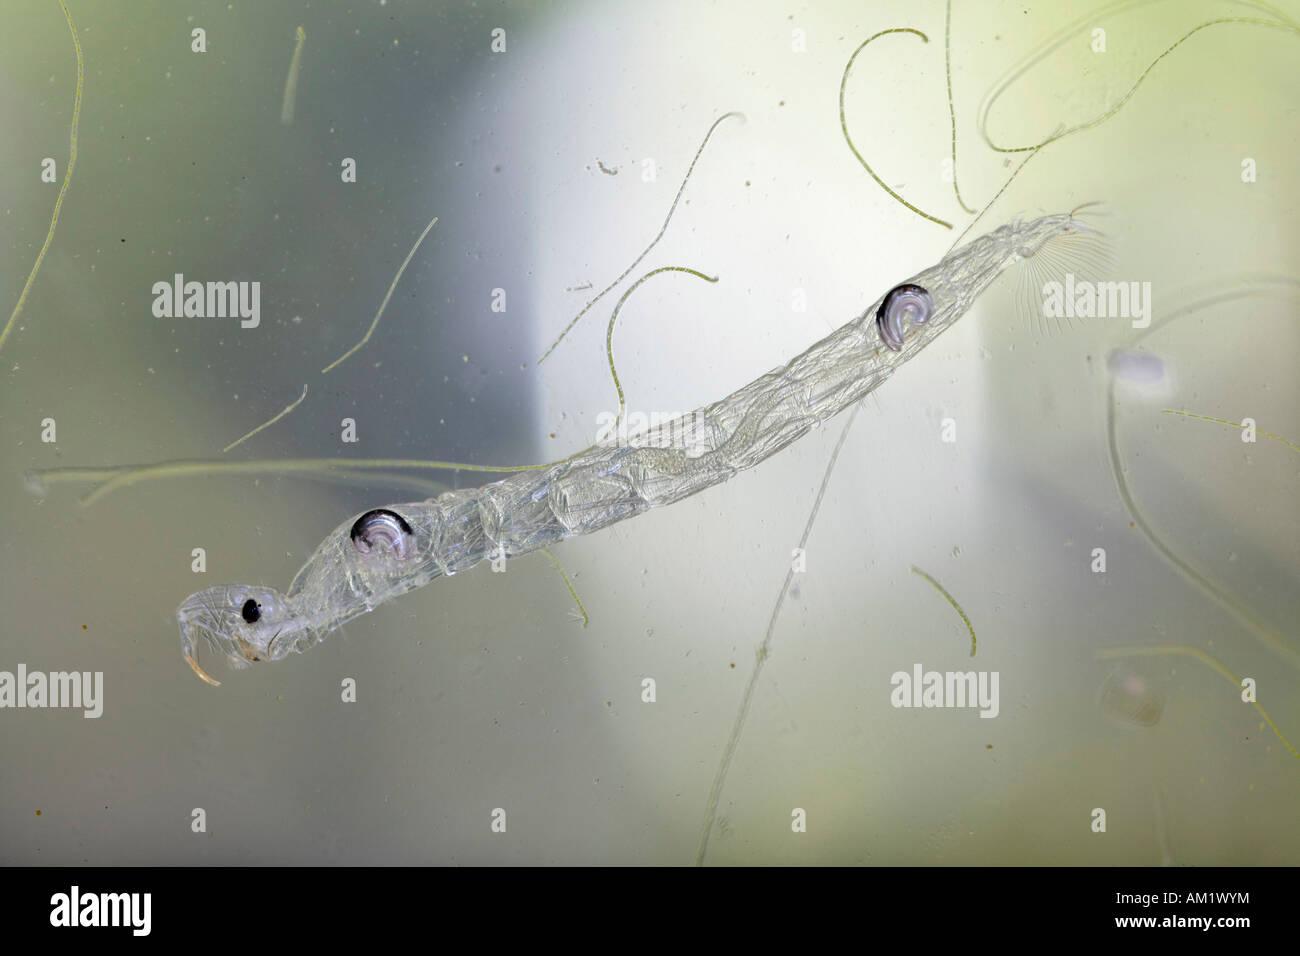 Larva of Phantom midge, Chaoborus crystallinus (Corethra plumicornis), Chaoboridae - Stock Image